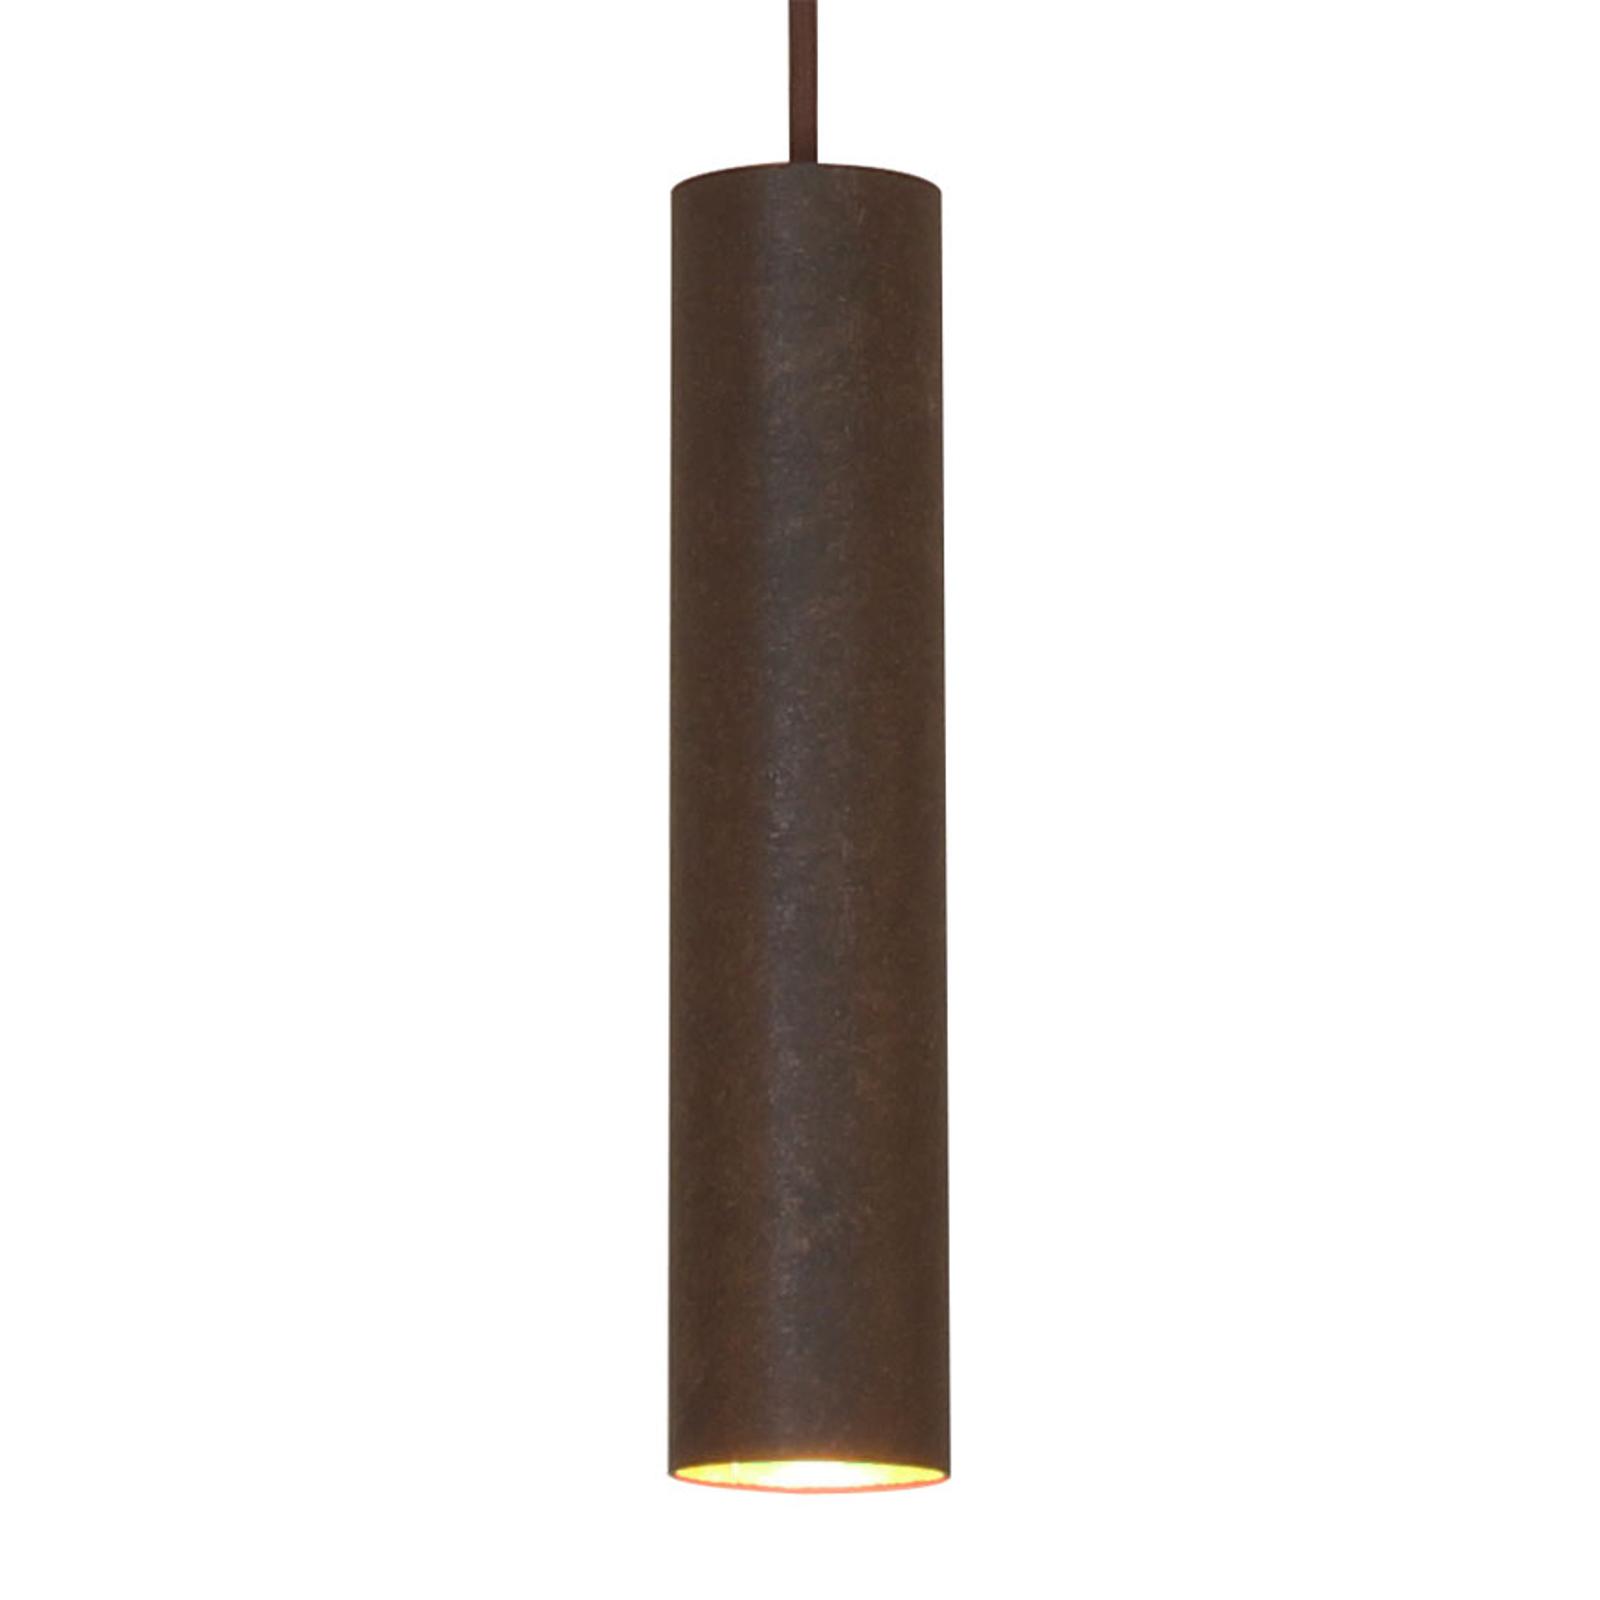 Menzel Solo Pipe hanglamp, bruin-zwart